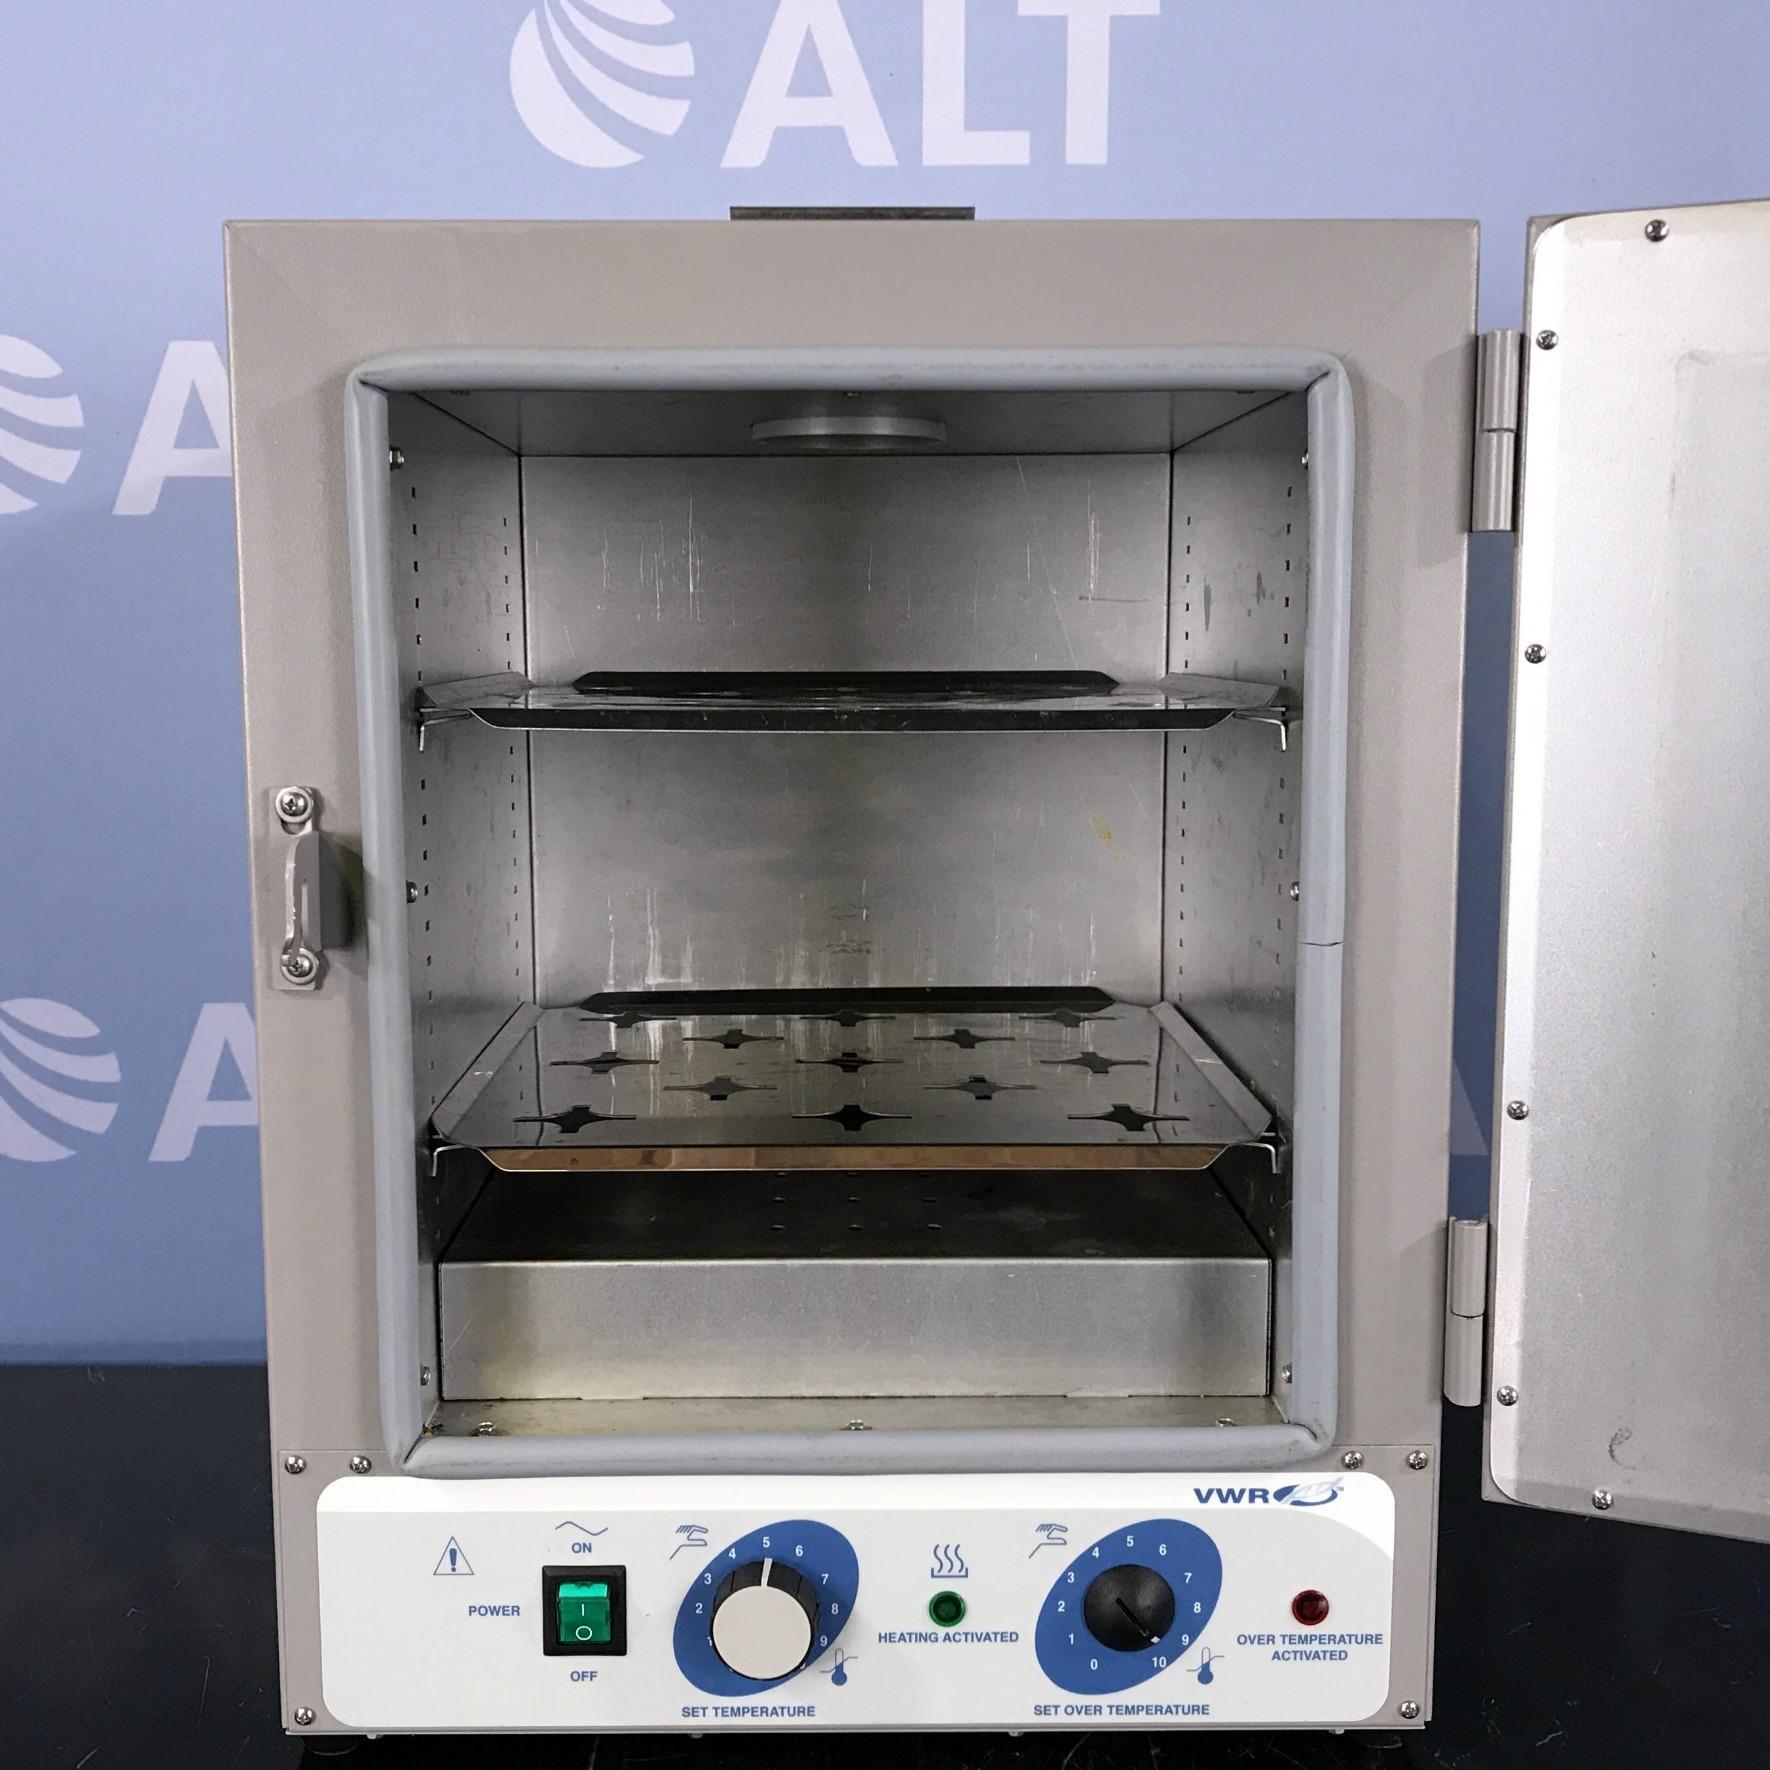 VWR / Shel Lab 1310 Gravity Convection Oven Image